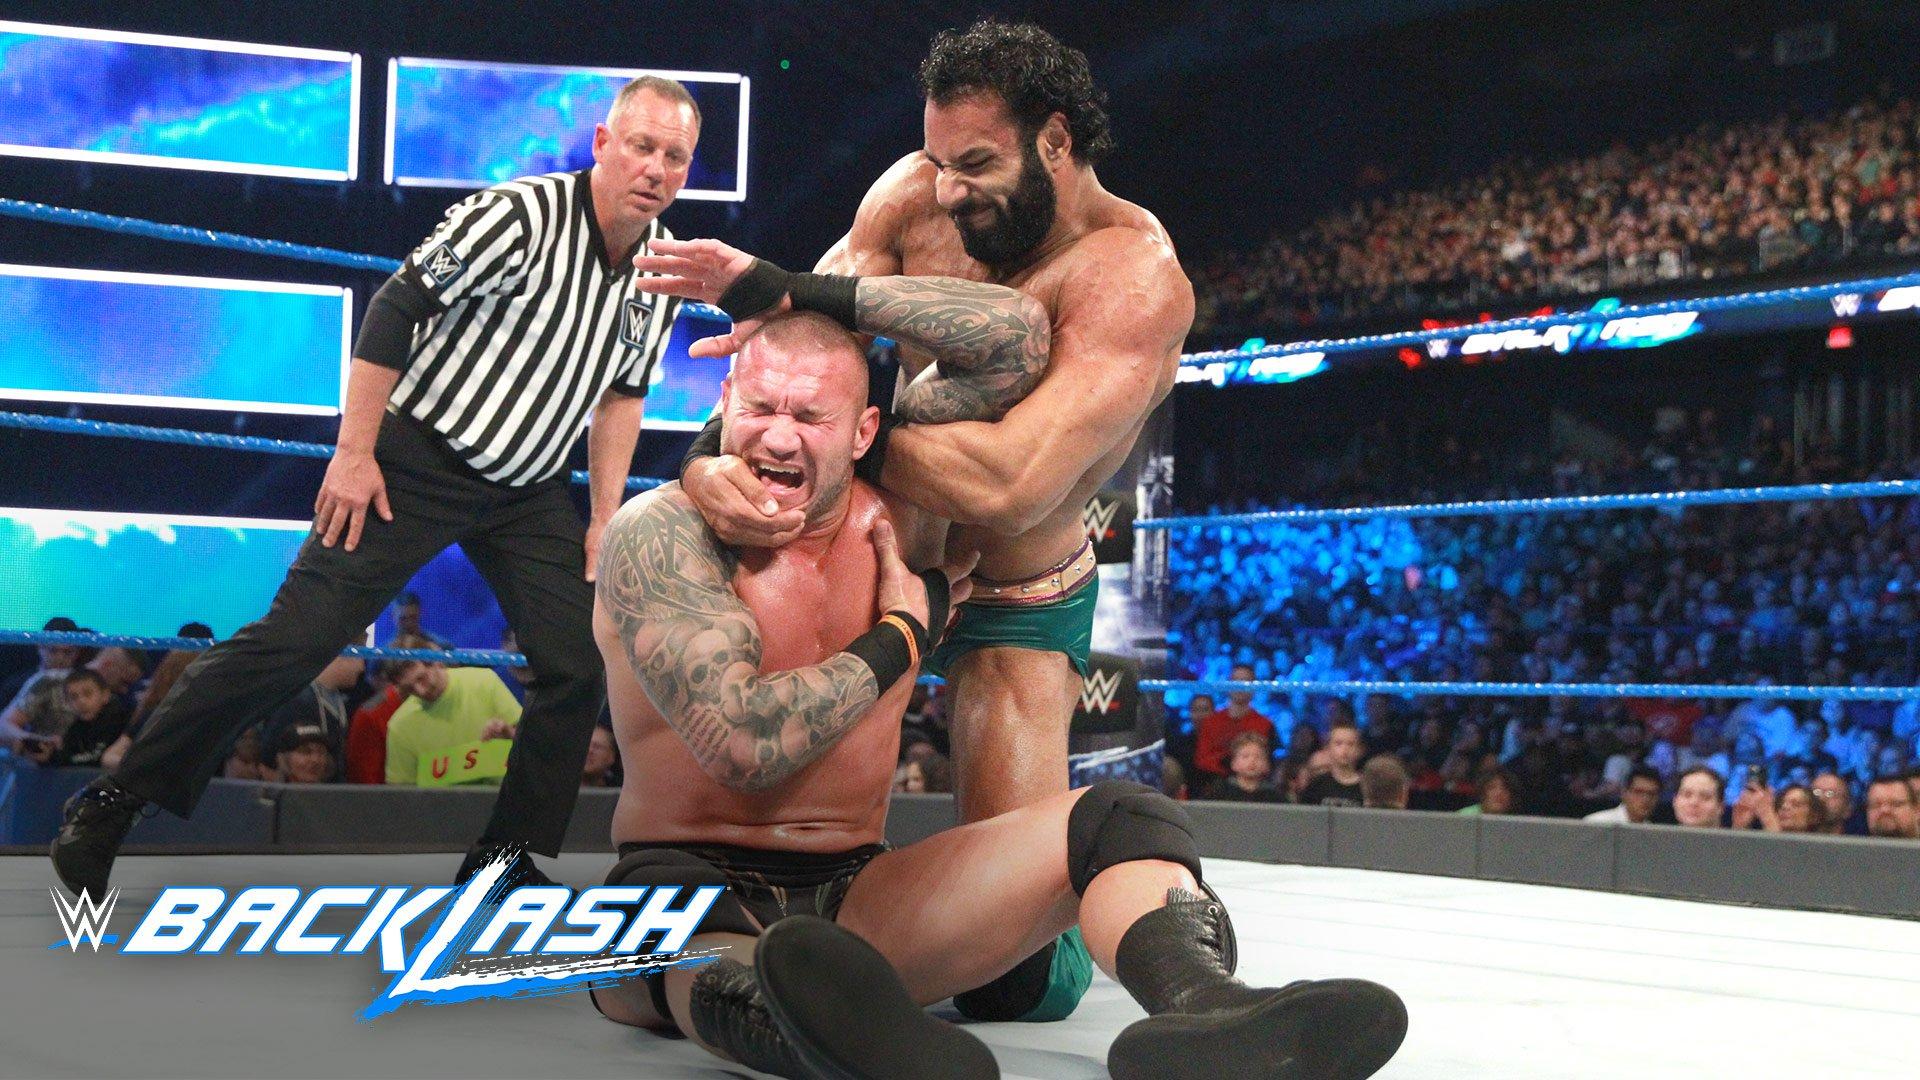 Randy Orton vs. Jinder Mahal - Match de Championnat de la WWE: WWE Backlash 2017 (WWE Network Exclusive)